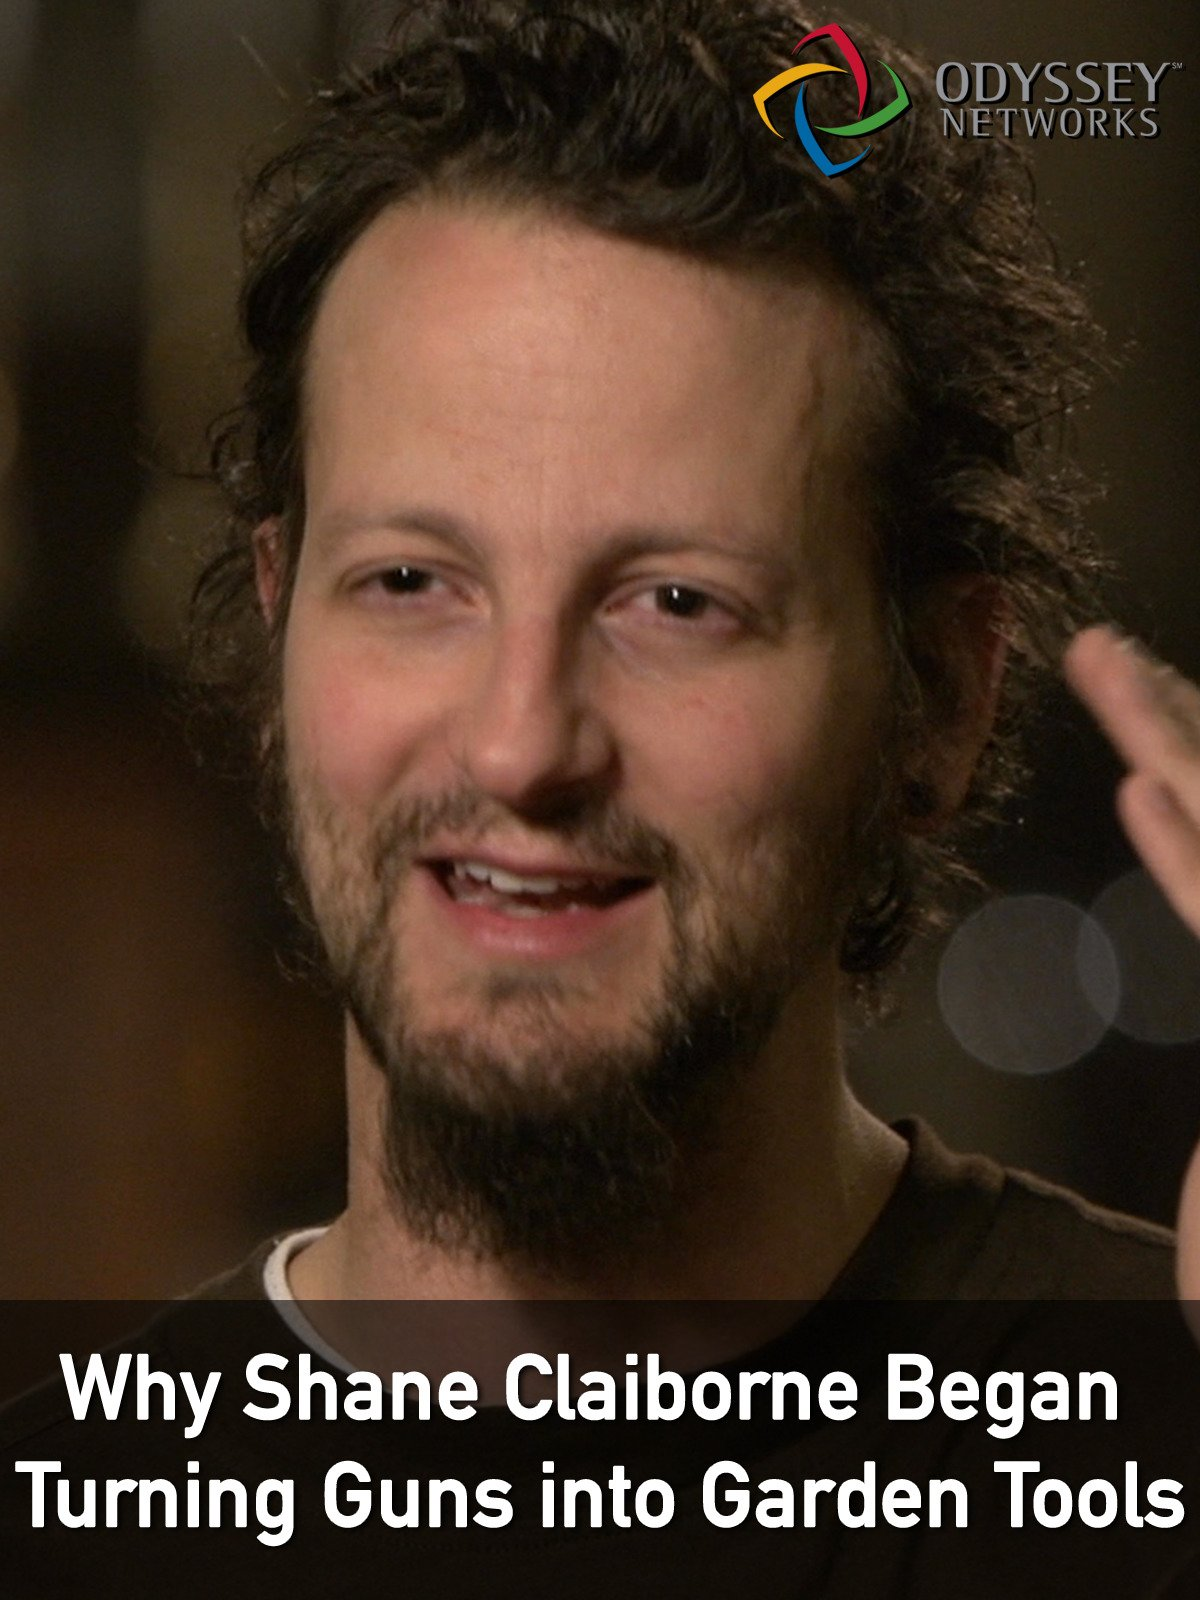 Clip: Why Shane Claiborne Began Turning Guns into Garden Tools